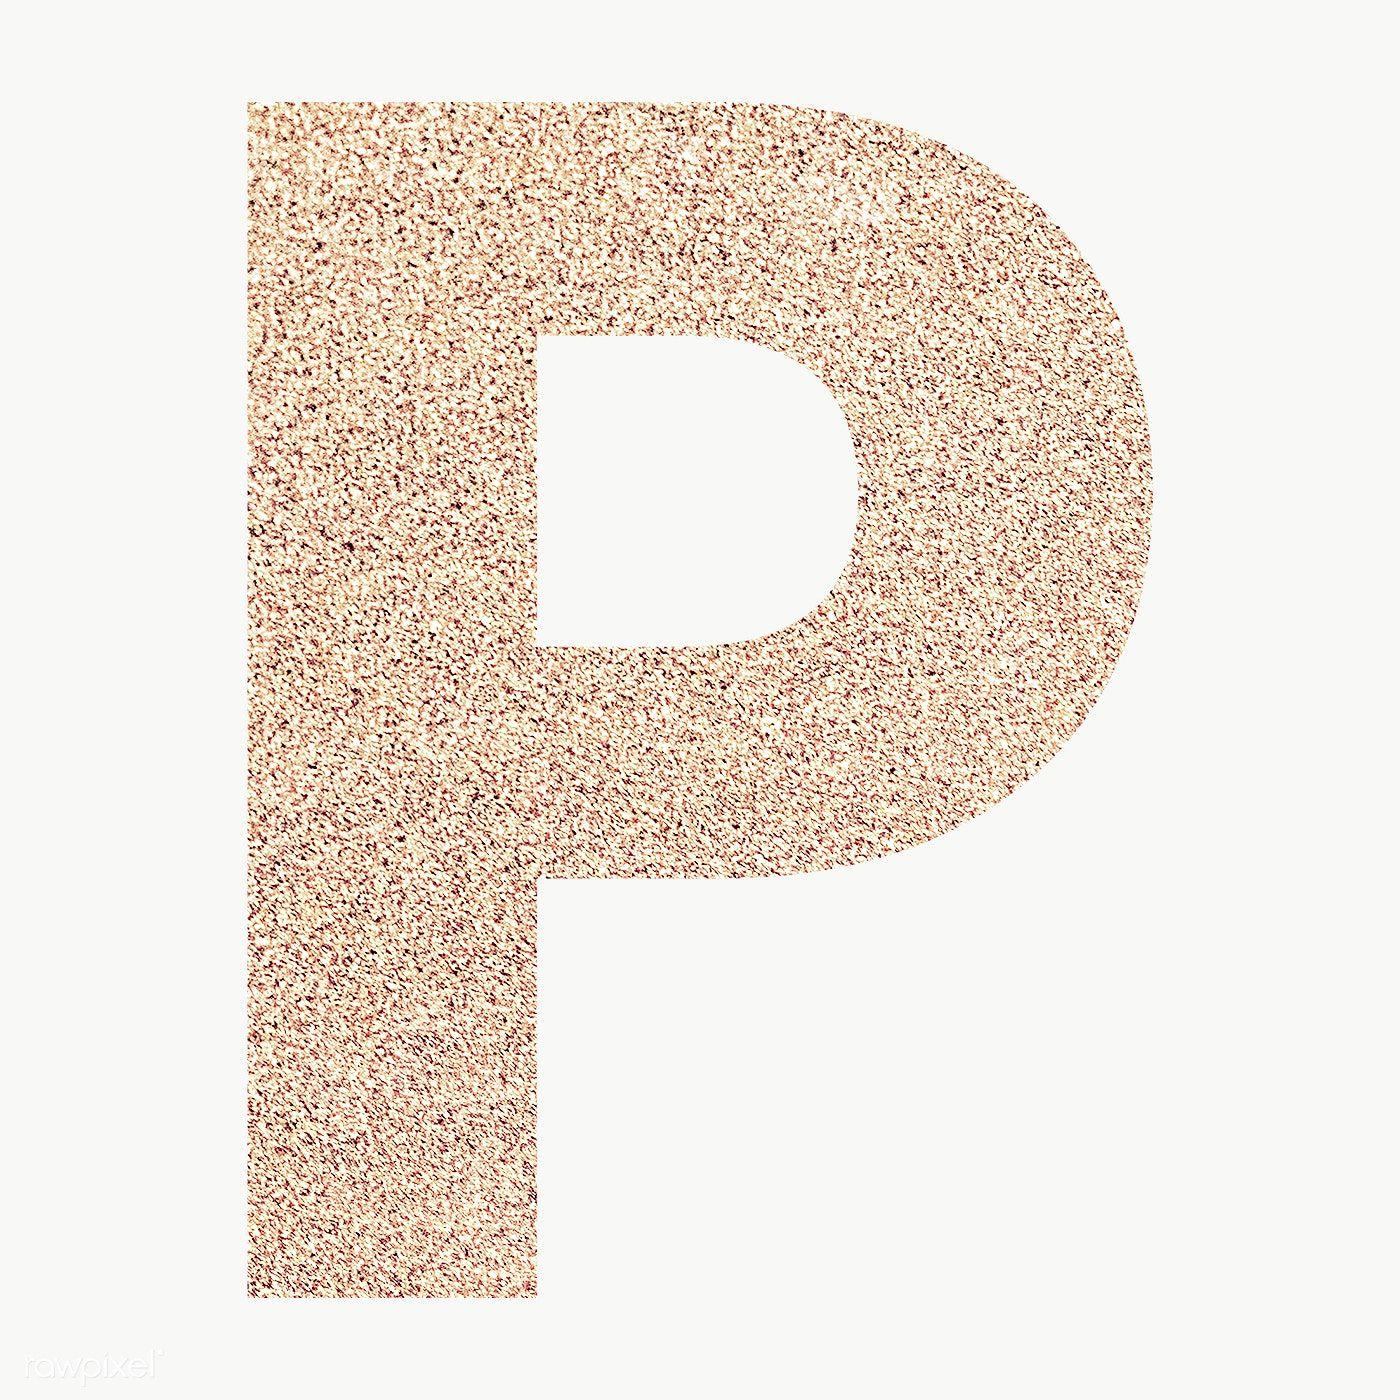 Glitter Capital Letter P Sticker Transparent Png Free Image By Rawpixel Com Ningzk V Transparent Stickers P Letter Design Bubble Letter P